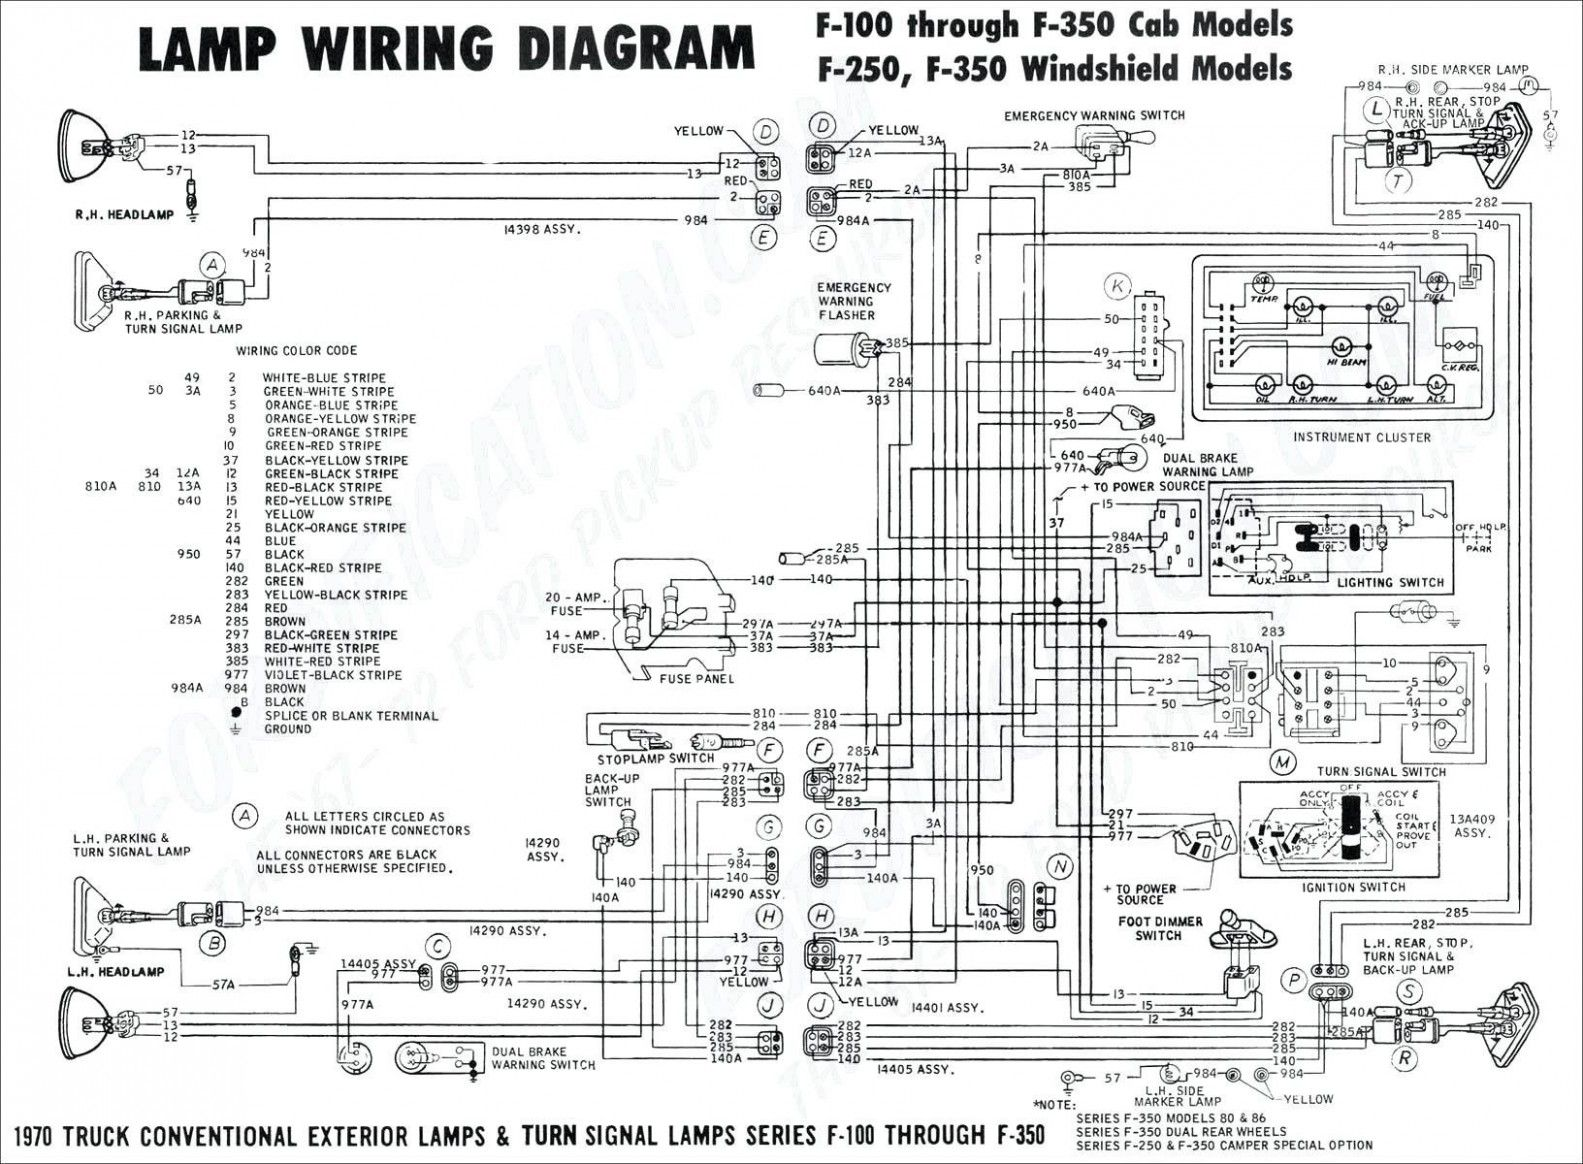 Engine Diagram 7 Ford Escape Yellow Di 2020 Nissan Maxima Ford Explorer Nissan